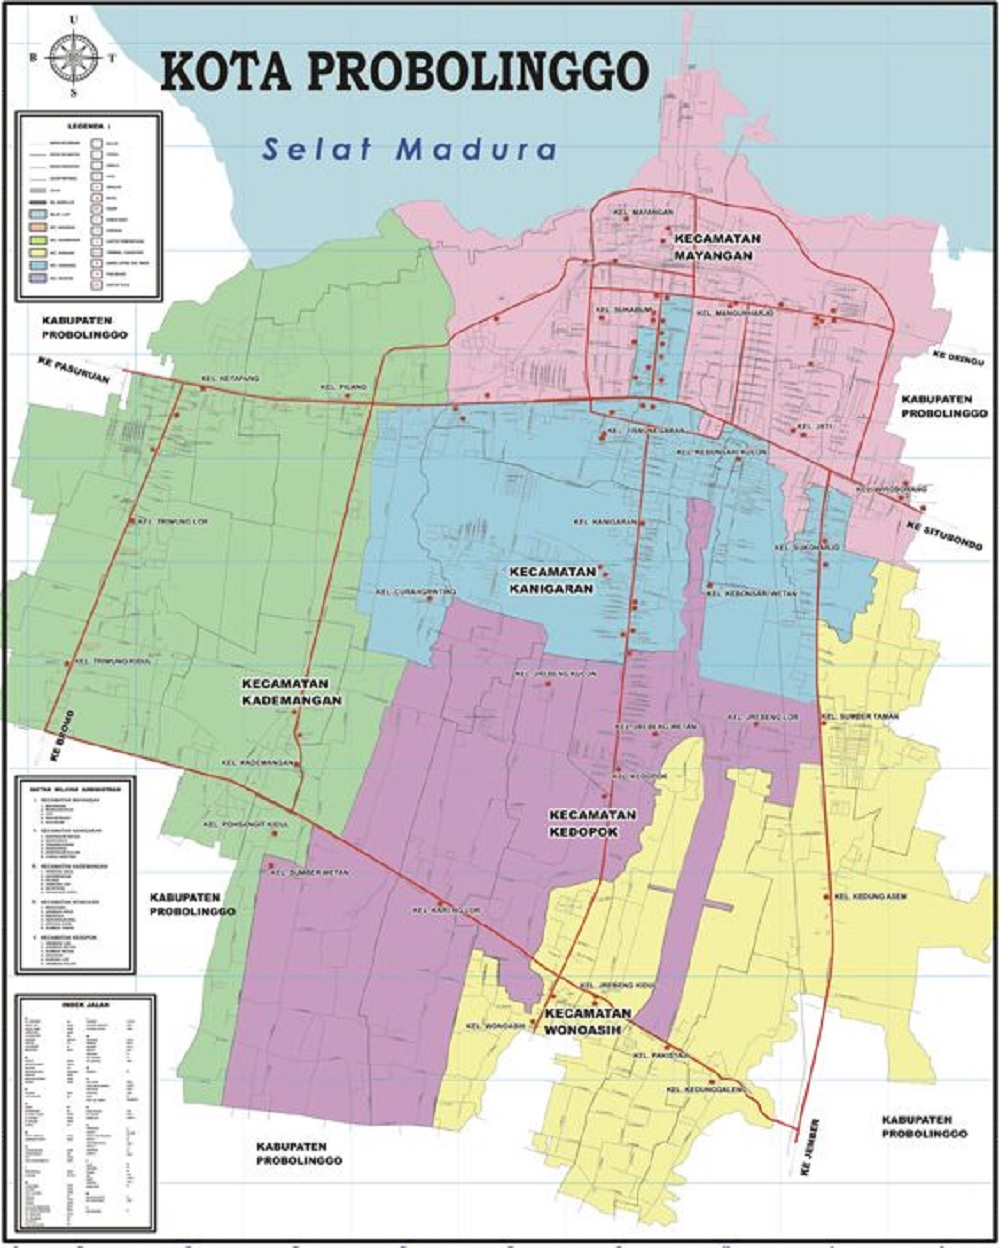 Peta Kota Probolinggo